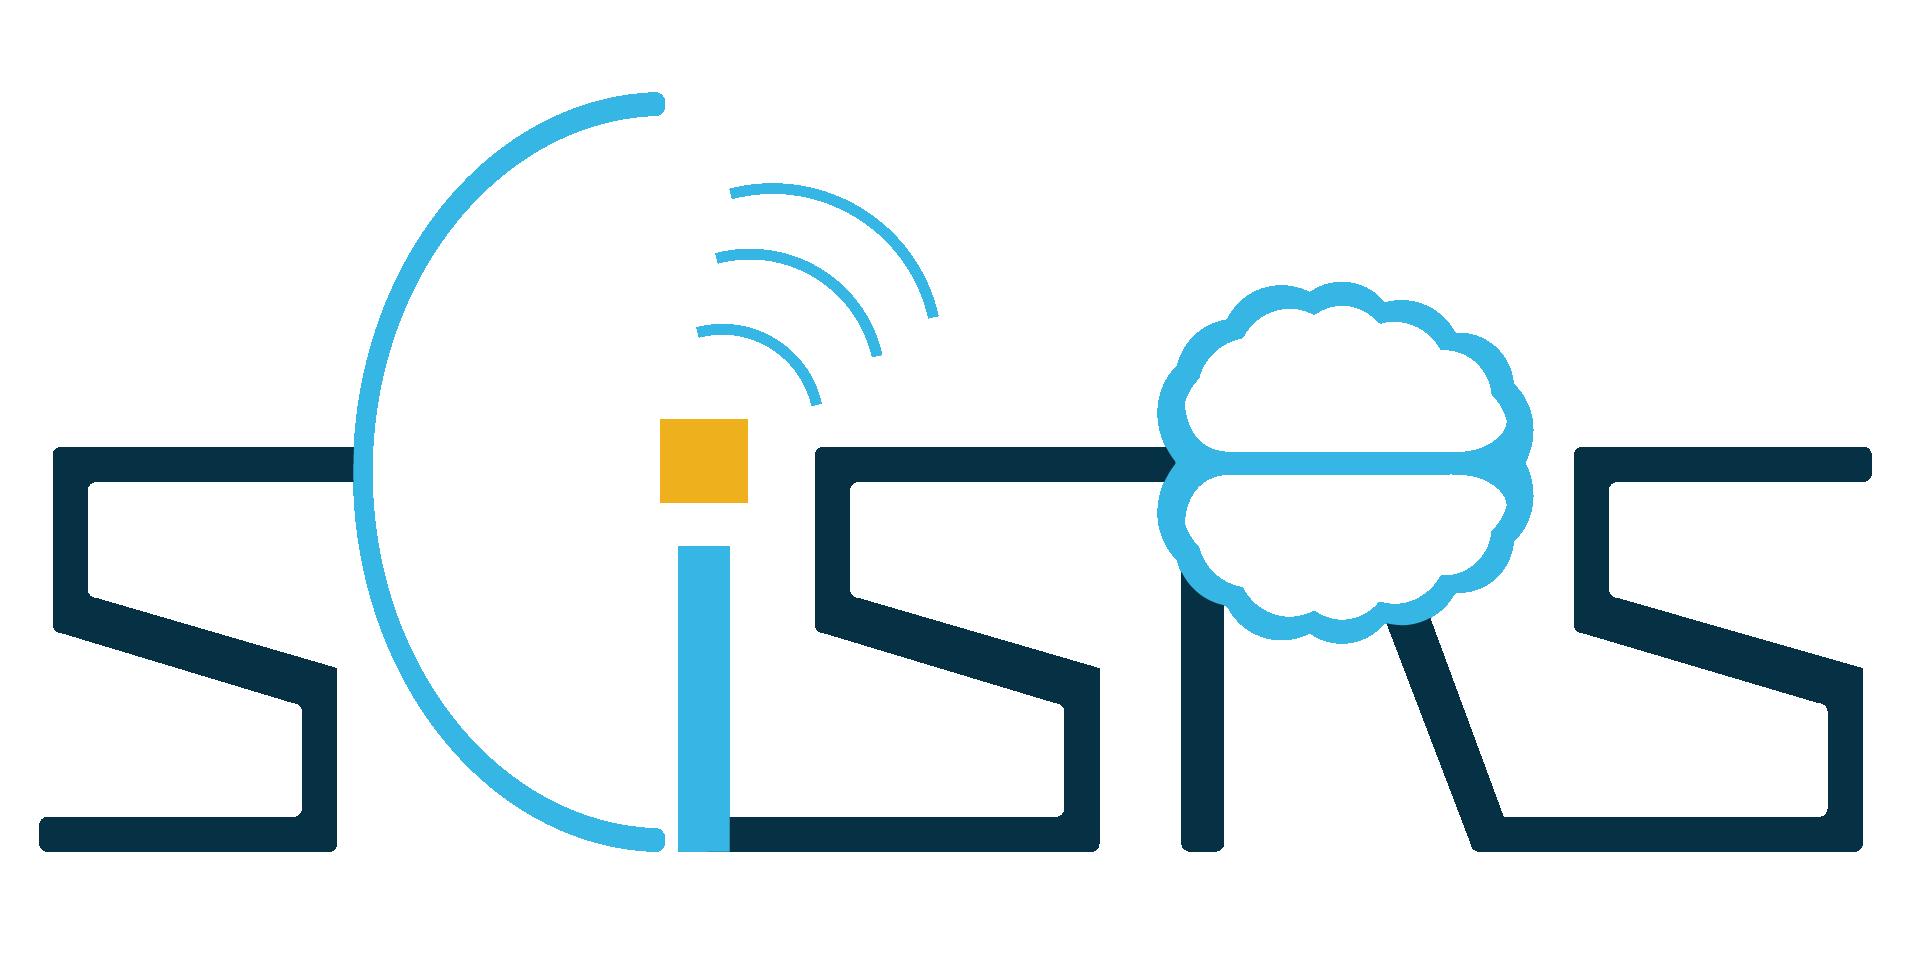 SCISRS Logo